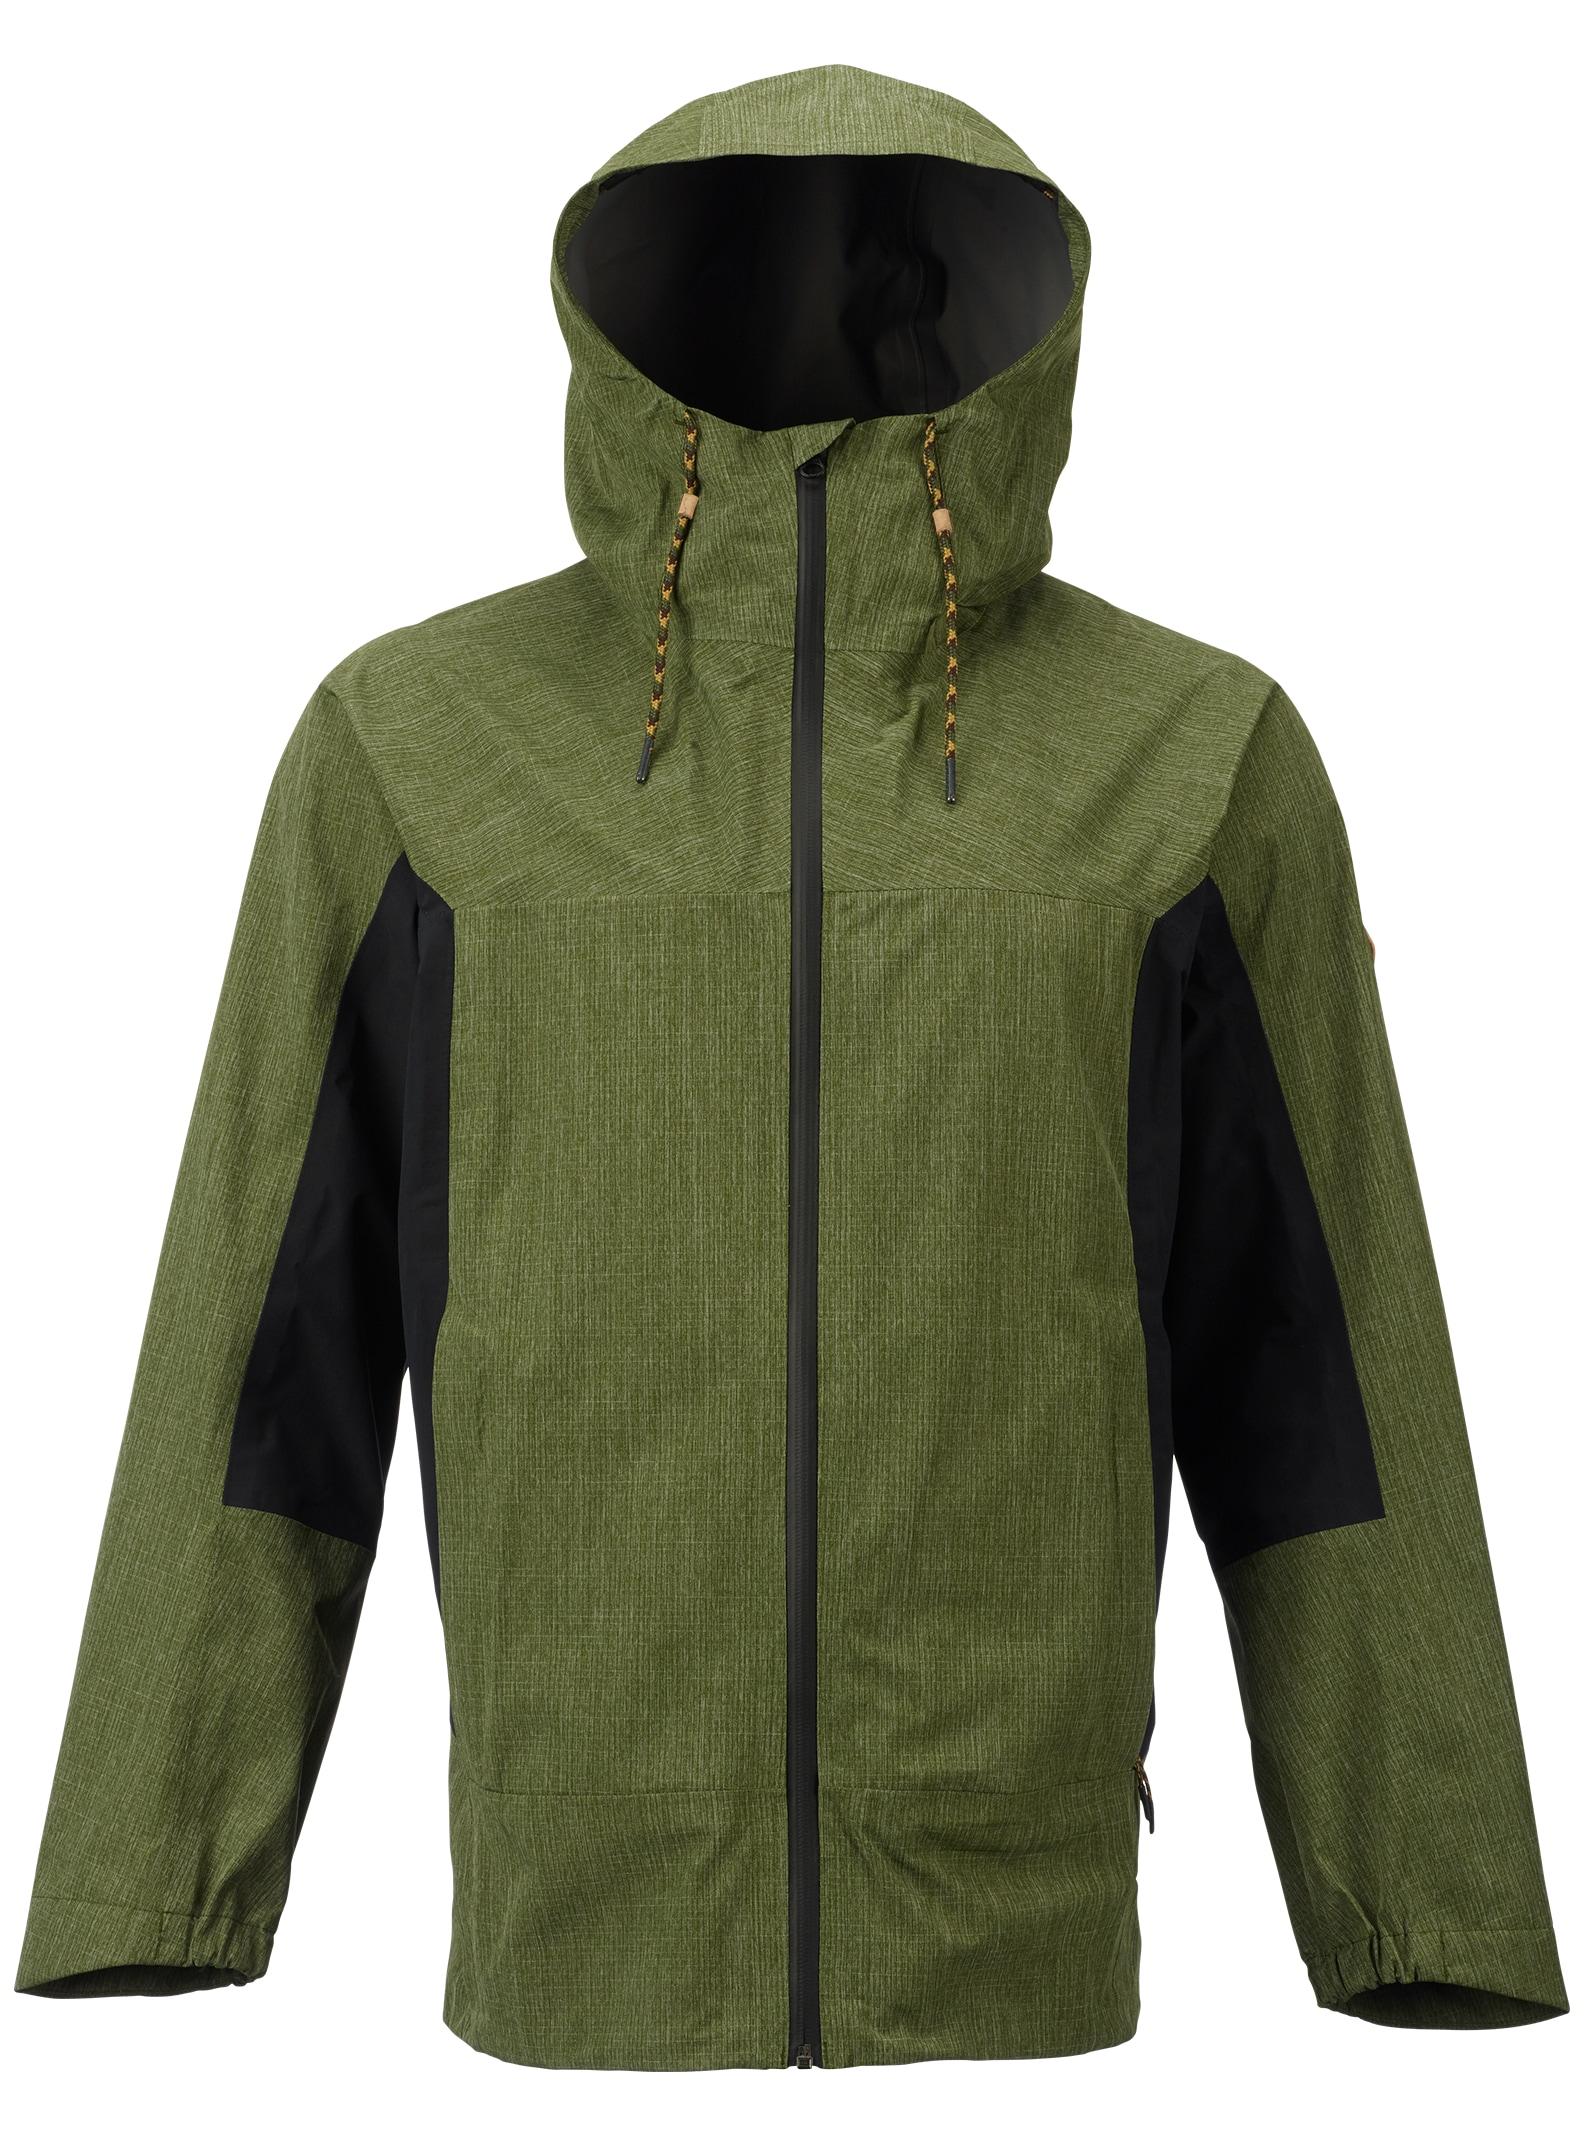 Burton GORE-TEX® 2L Packrite Rain Jacket shown in Rifle Green / True Black